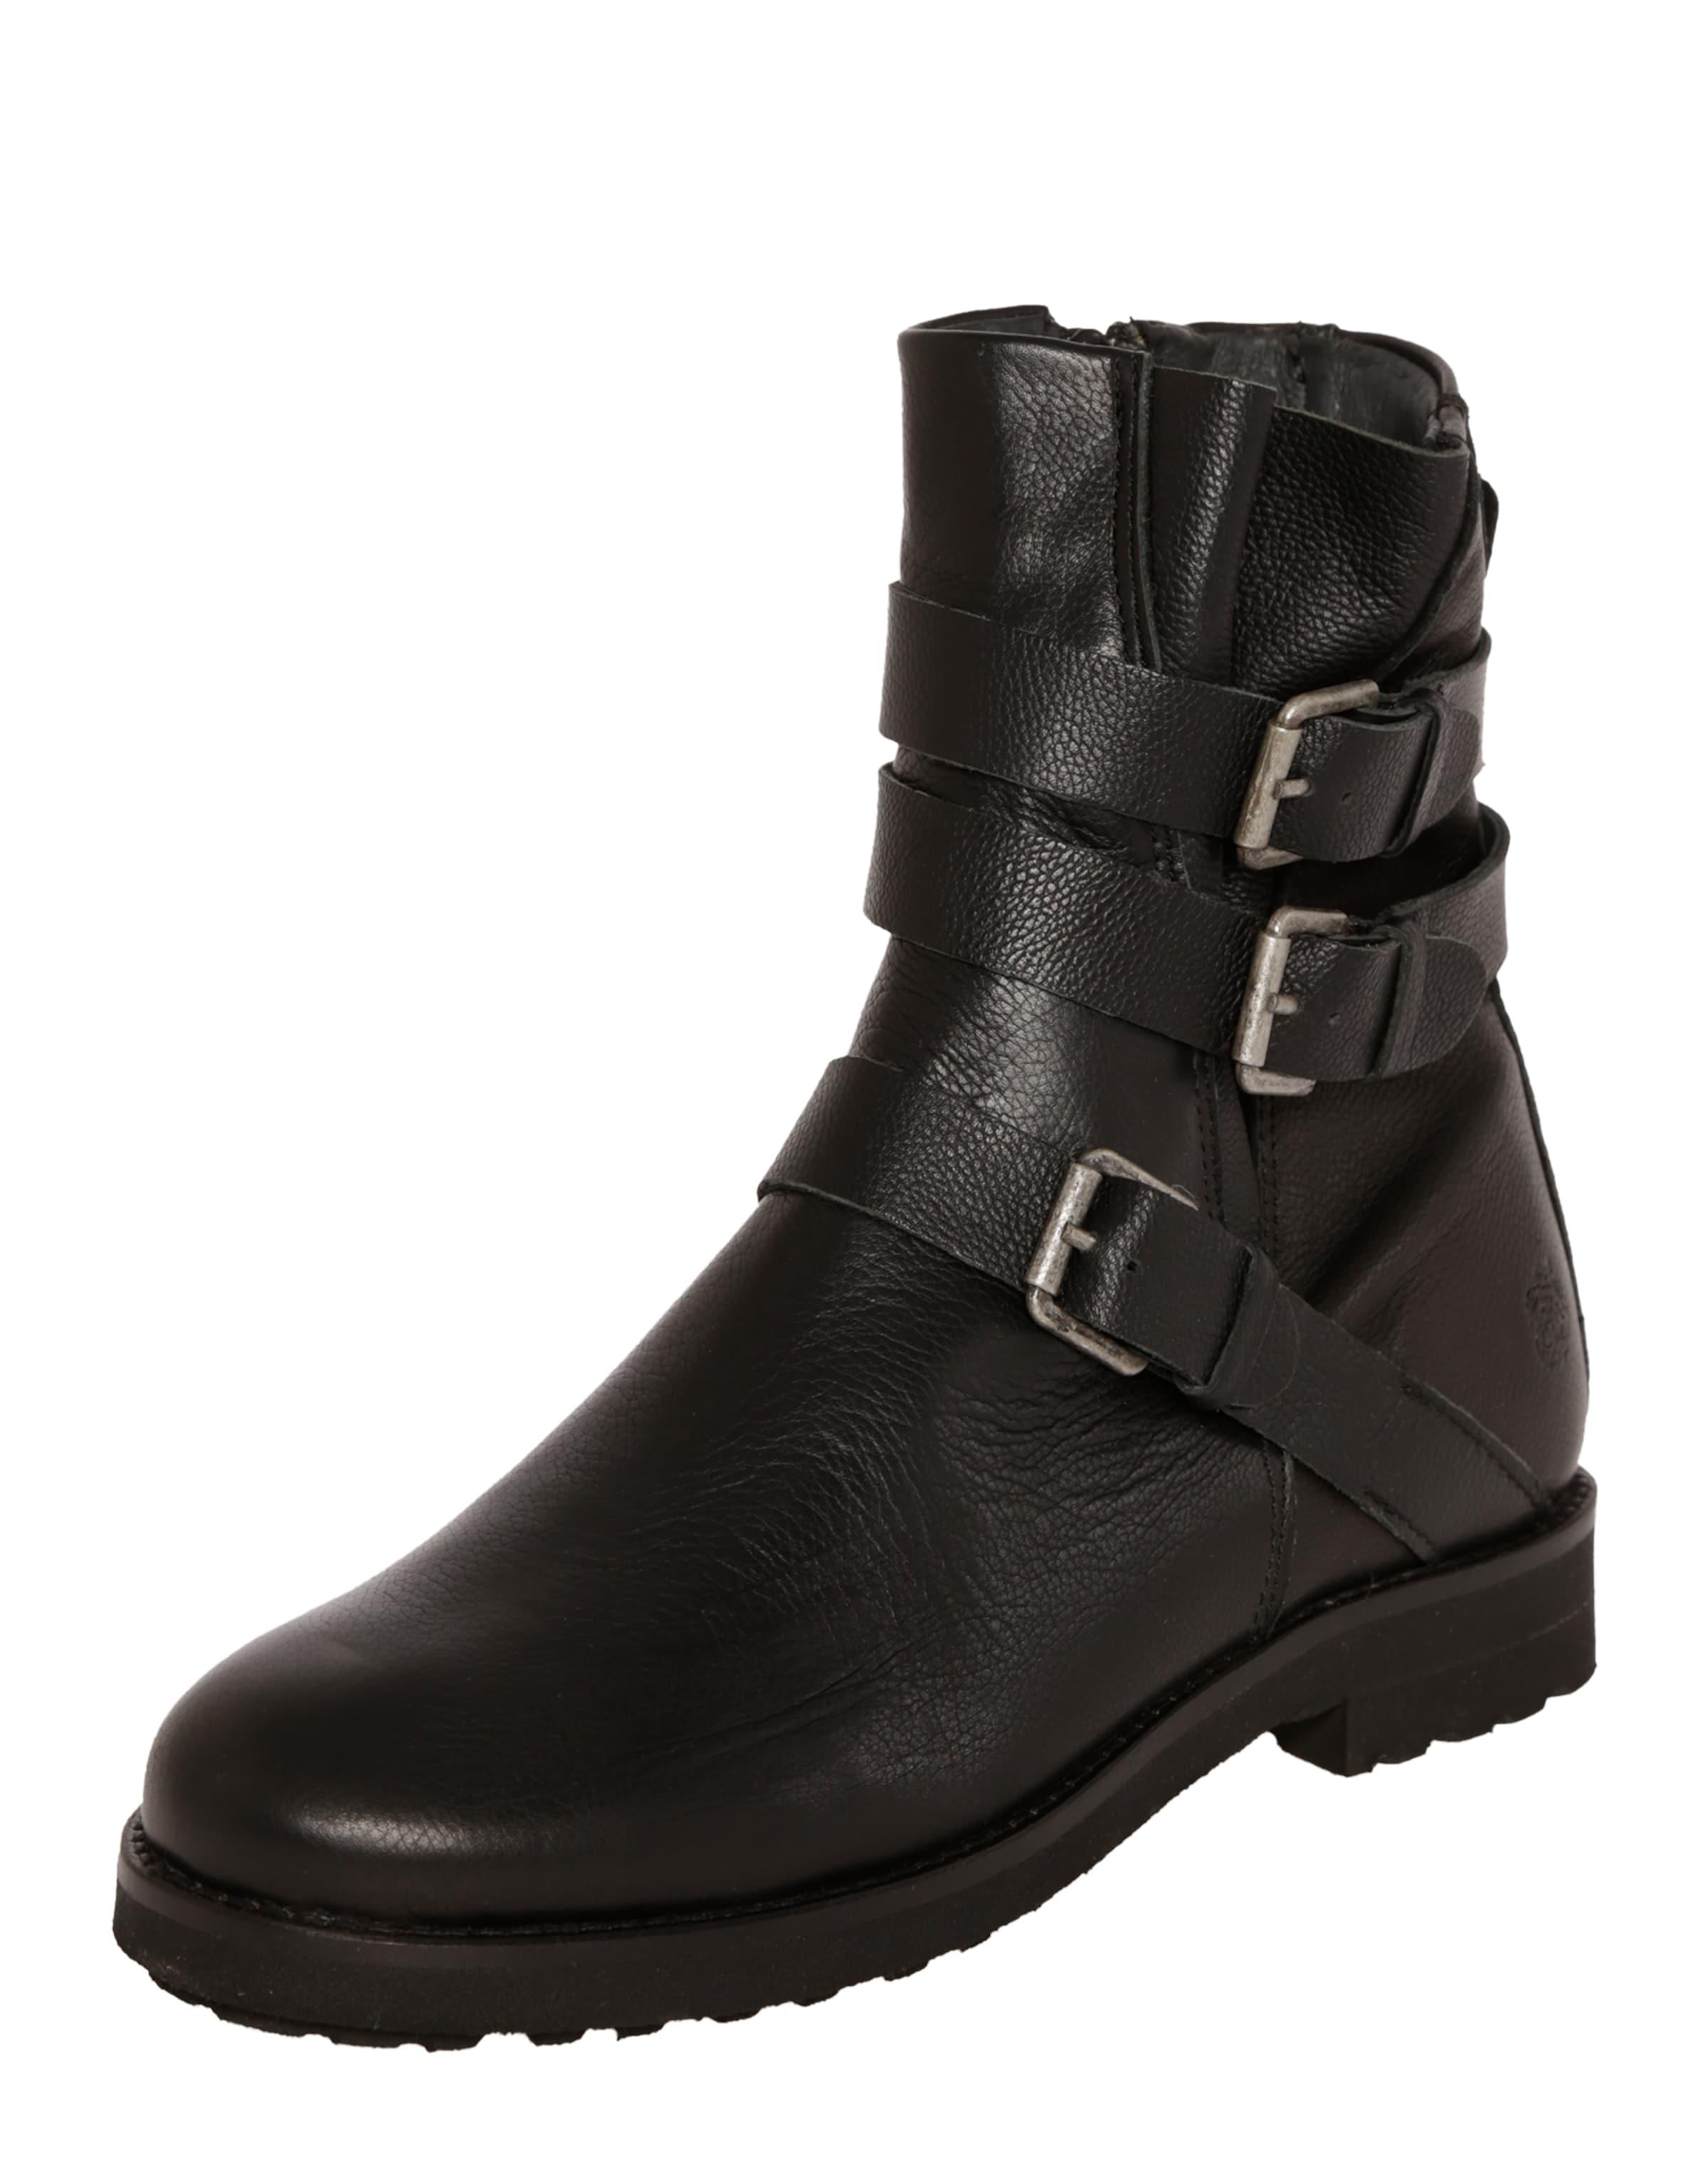 Apple Of Eden Leder-Boots 'Alanis' schwarz qfmQc